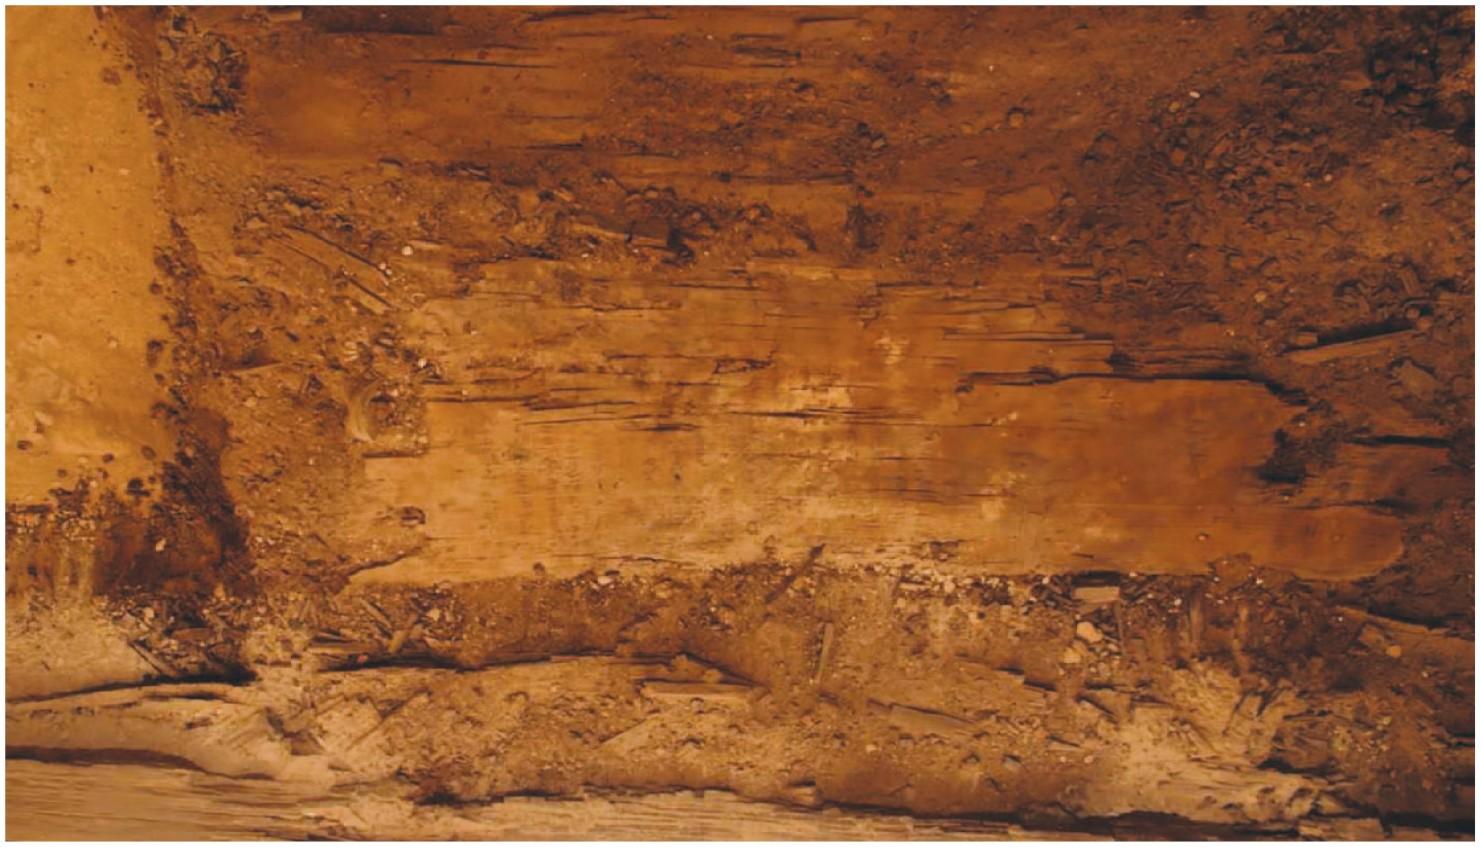 Local onde o livro foi encontrado, na tumba de Ankh (Foto: Harco Willems/Journal of Egyptian Archaeology)